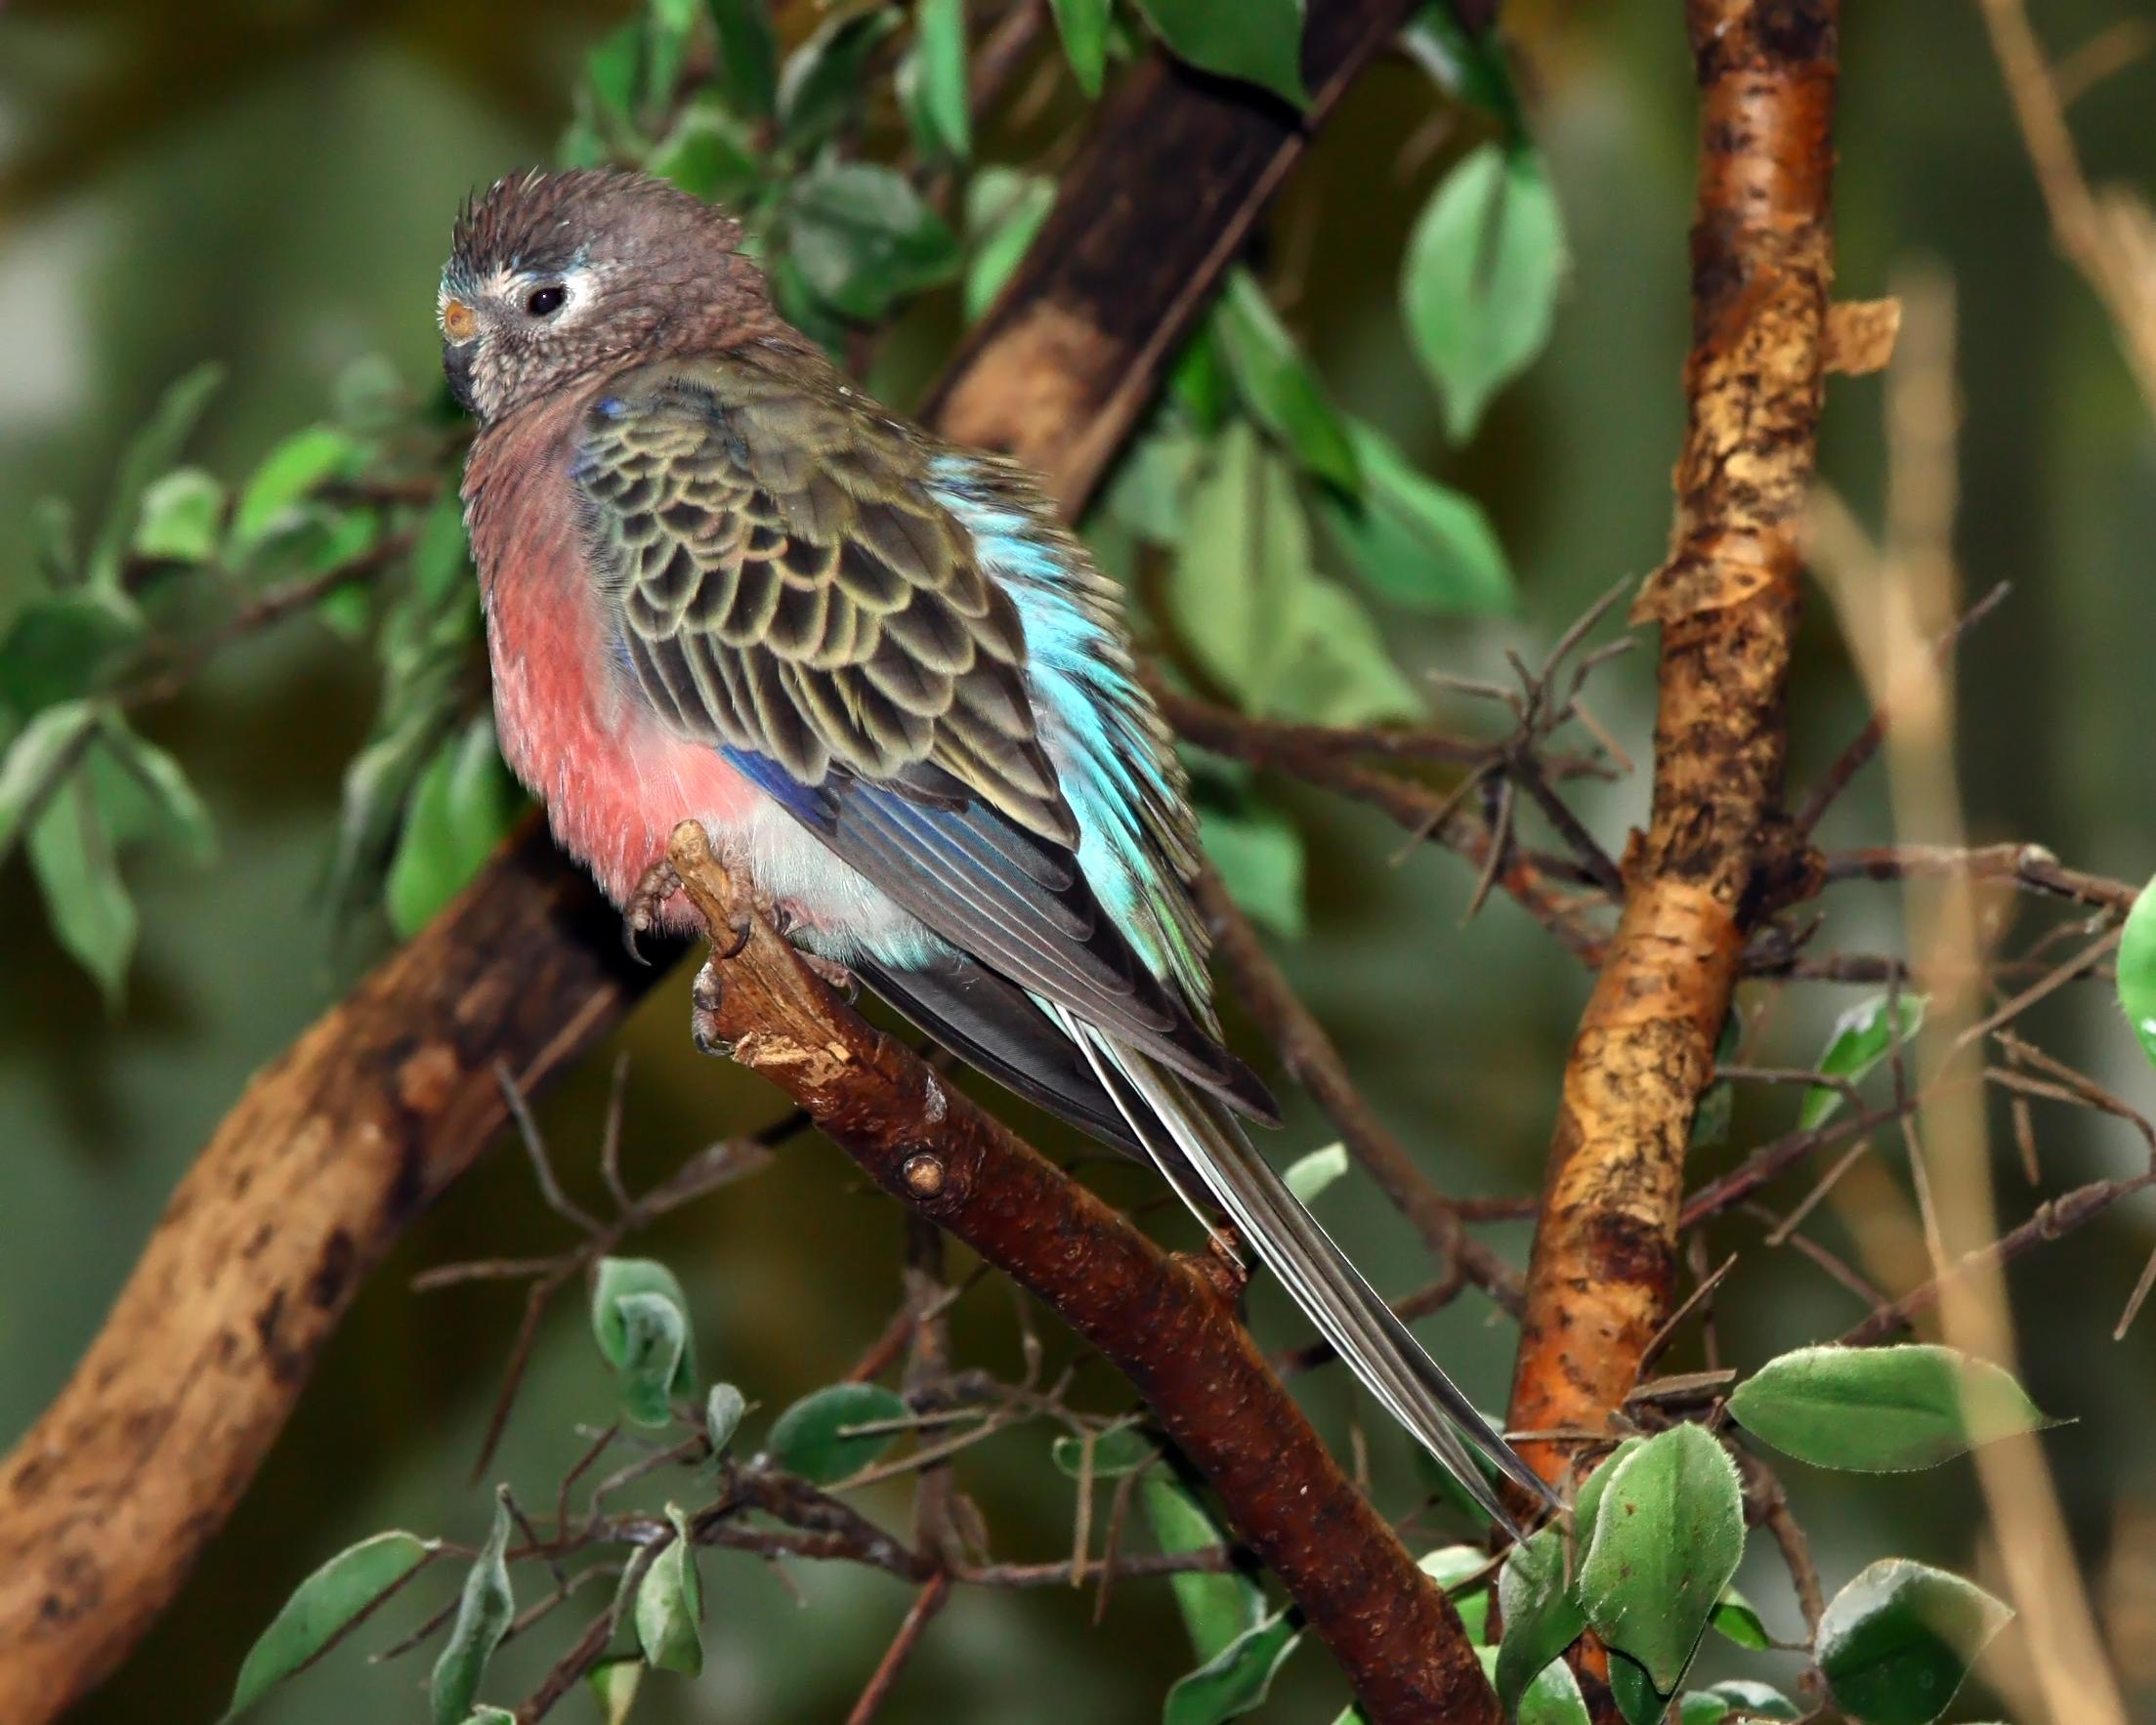 Bourke's Parrot - Neopsephotus bourkii